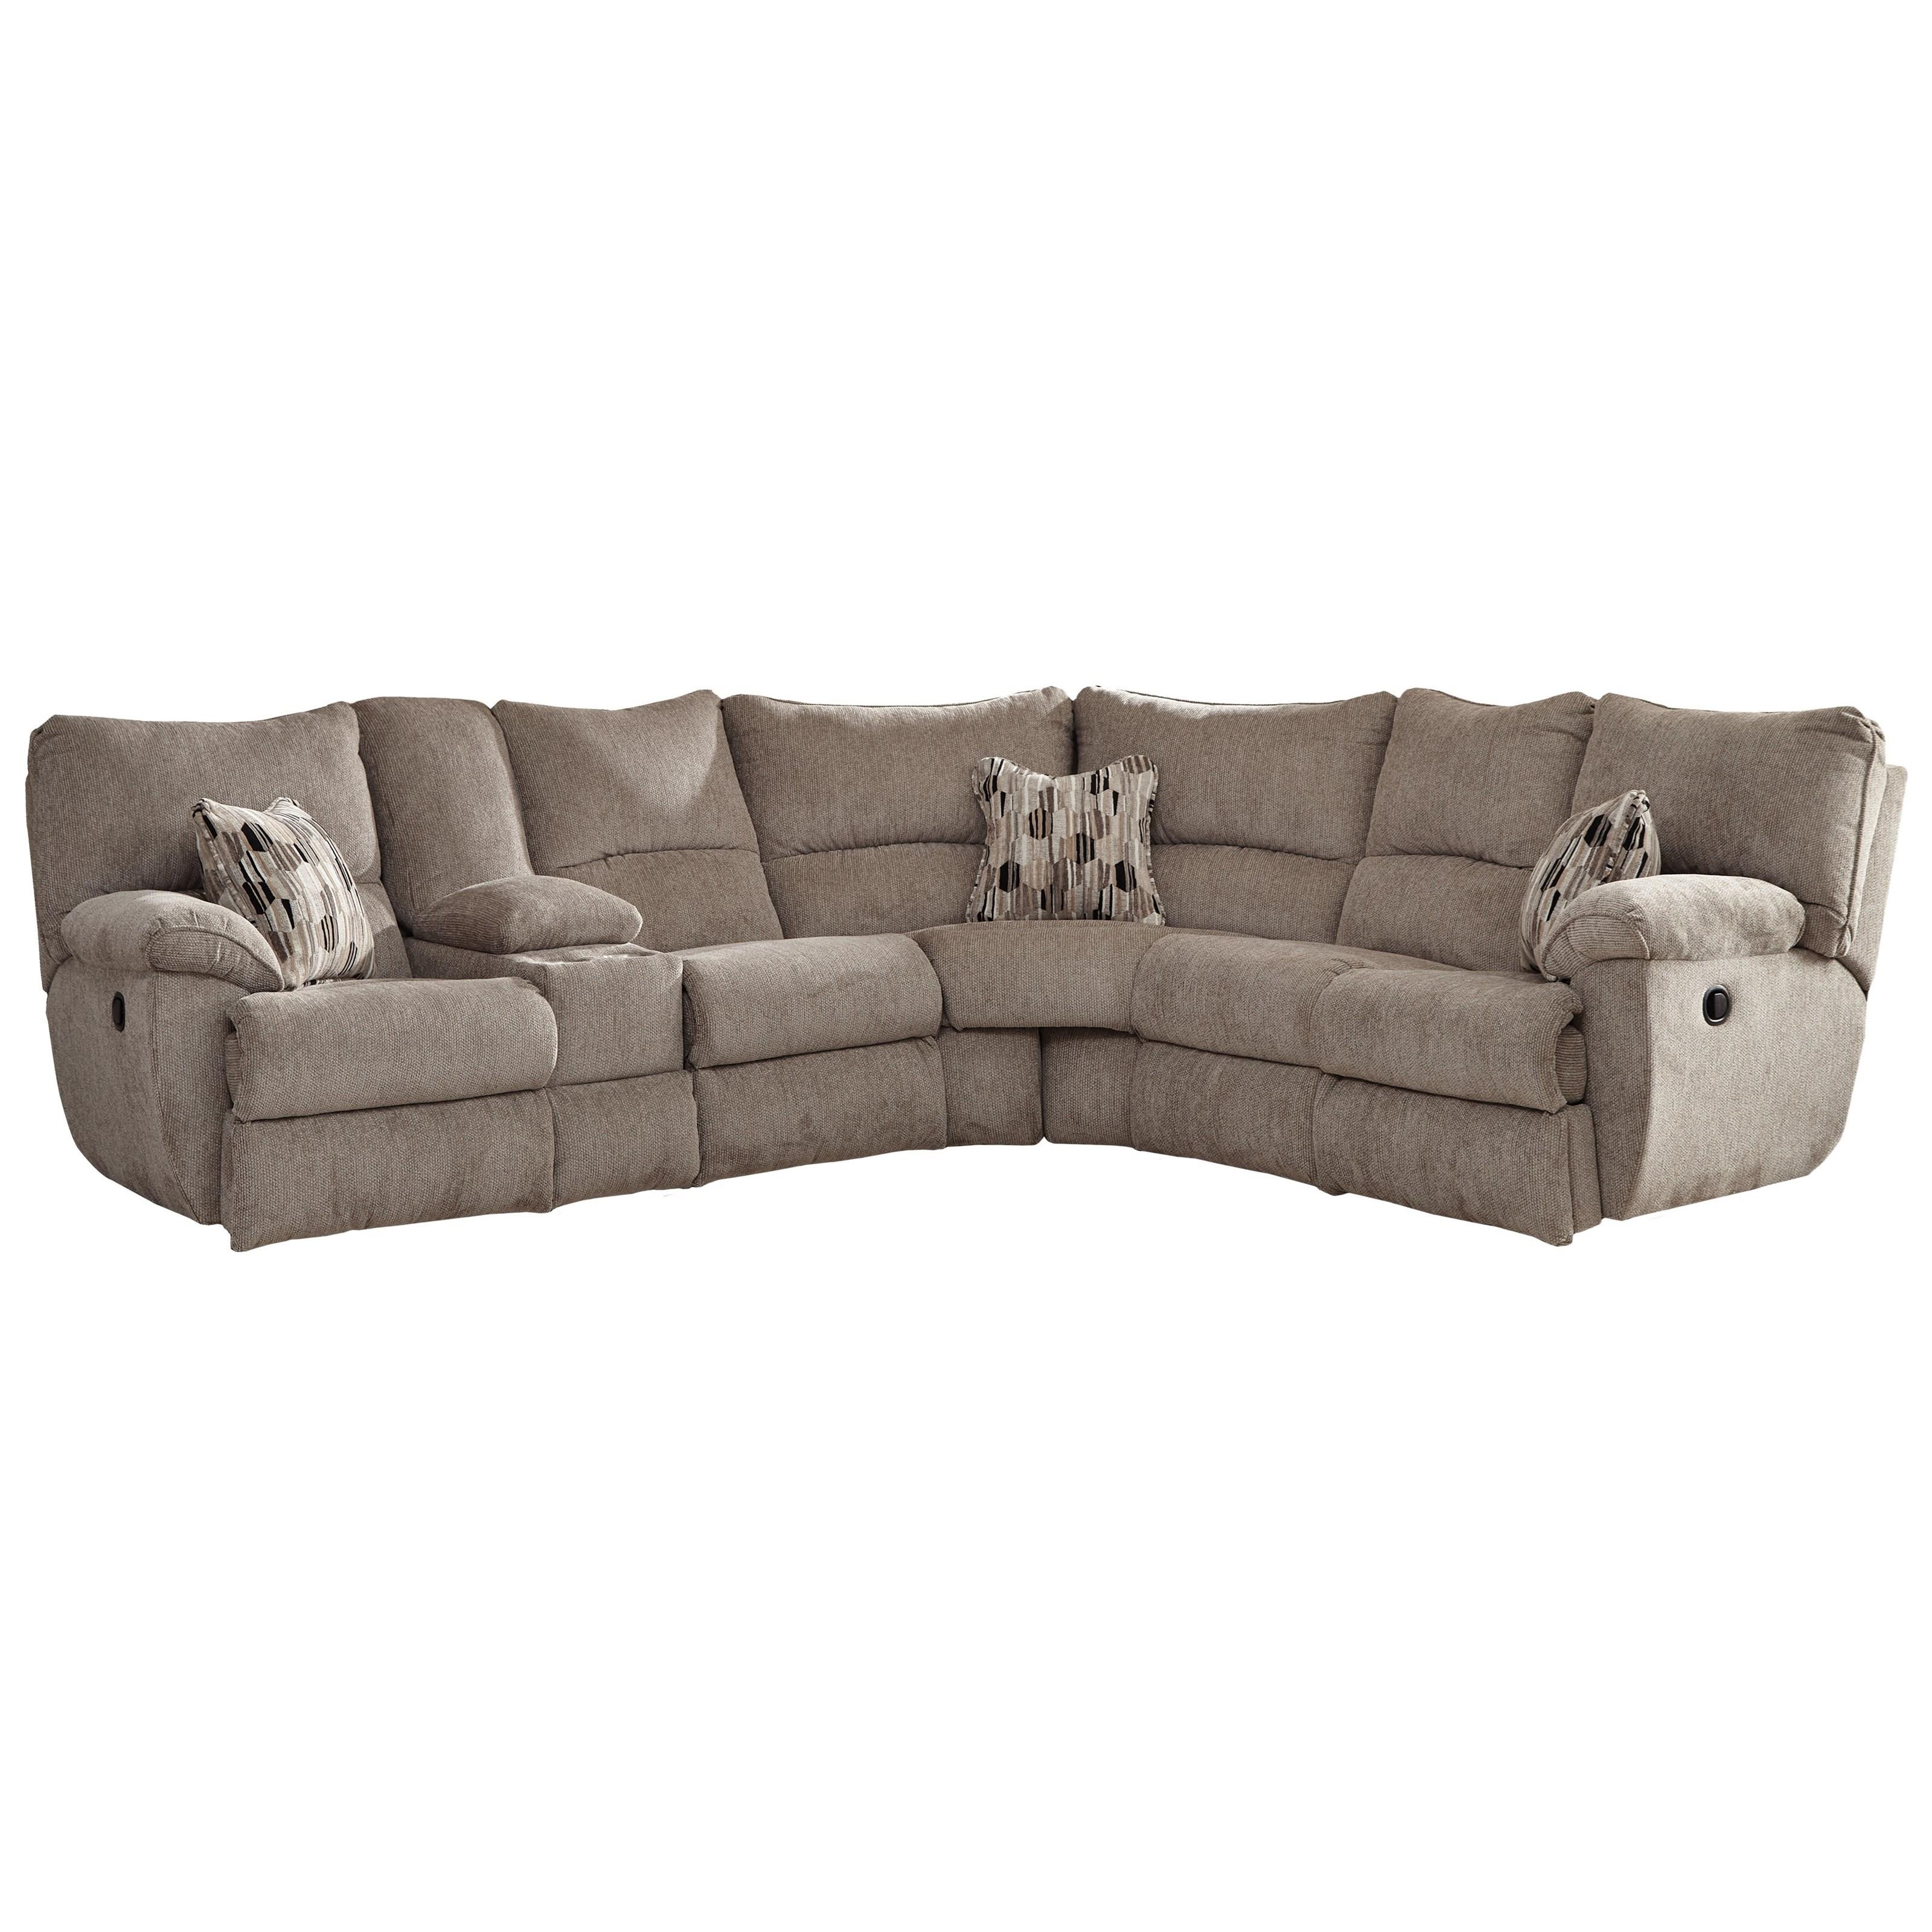 catnapper elliott lay flat sectional sofa with storage console rh greatamericanhomestore com  catnapper sectional sofas with recliners